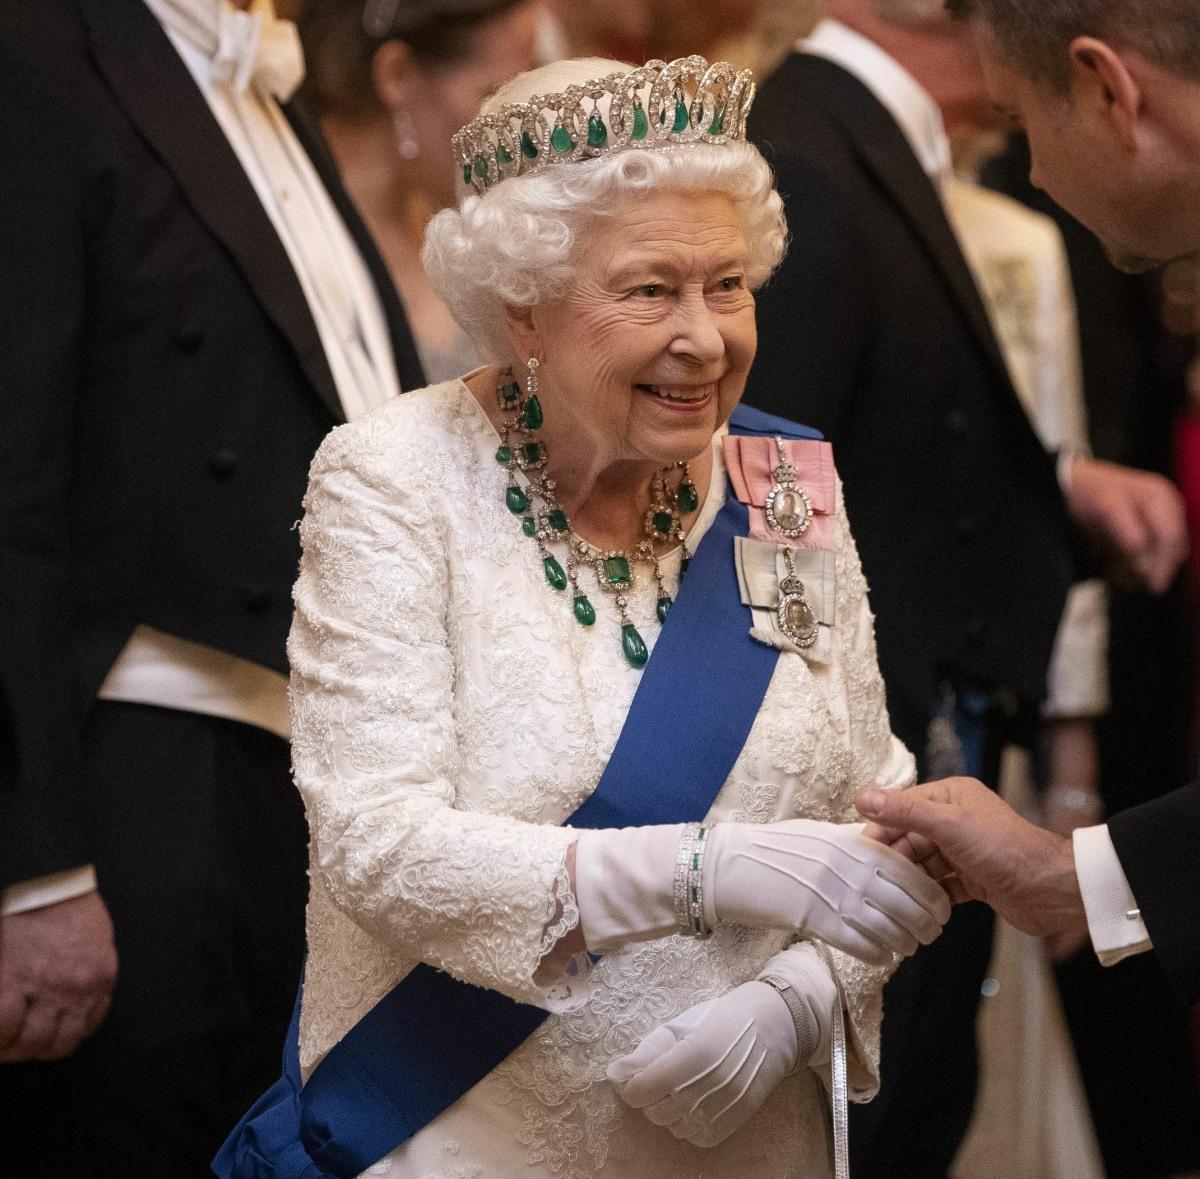 Accoglienza diplomatica di Buckingham Palace